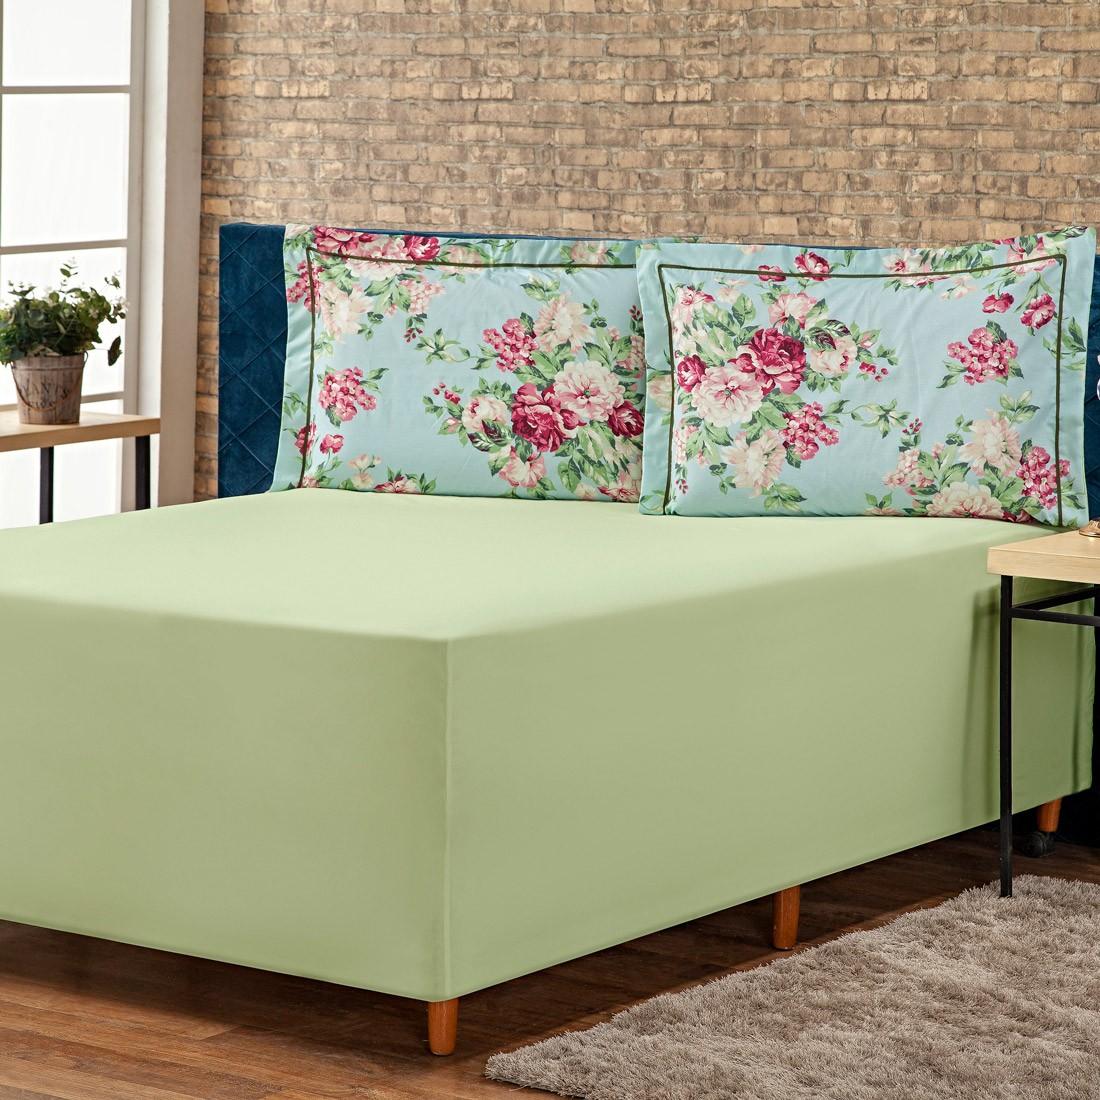 Jogo de Lençol p/ Cama Box Complet Floral Verde/Pink Queen 03 Peças - Percal 140 Fios